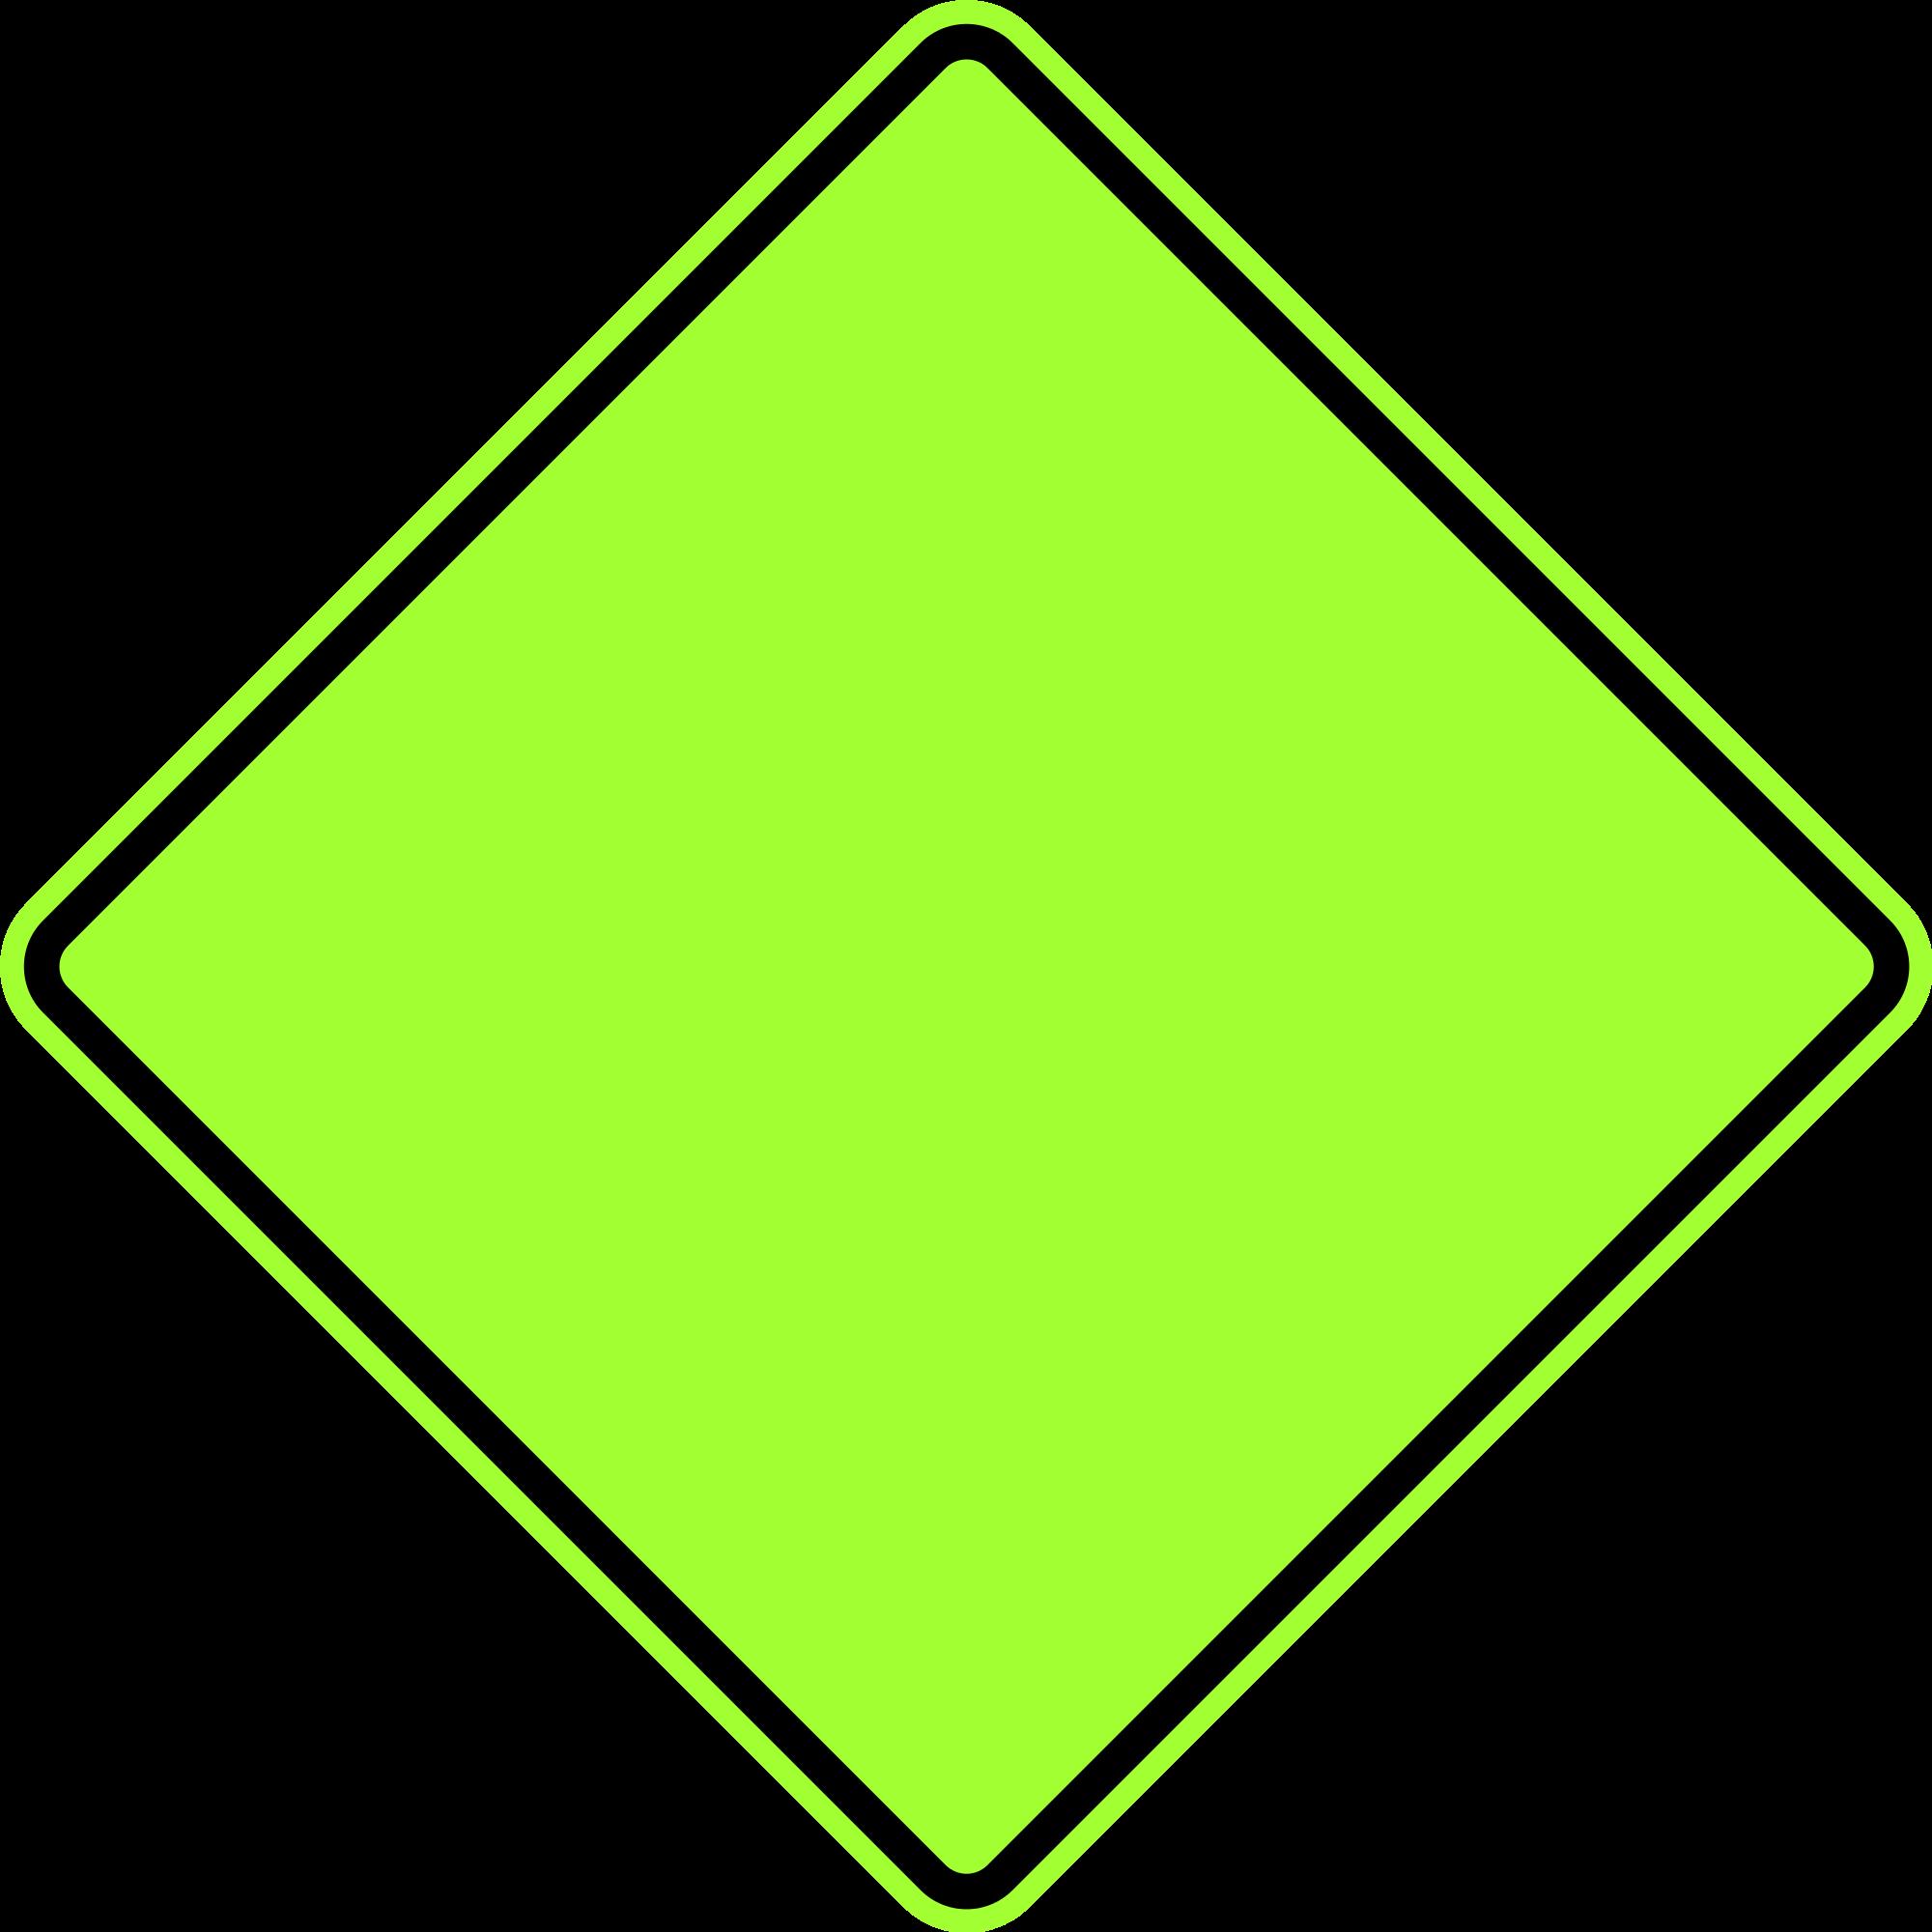 File warning sign fluorescent. Diamond clipart square